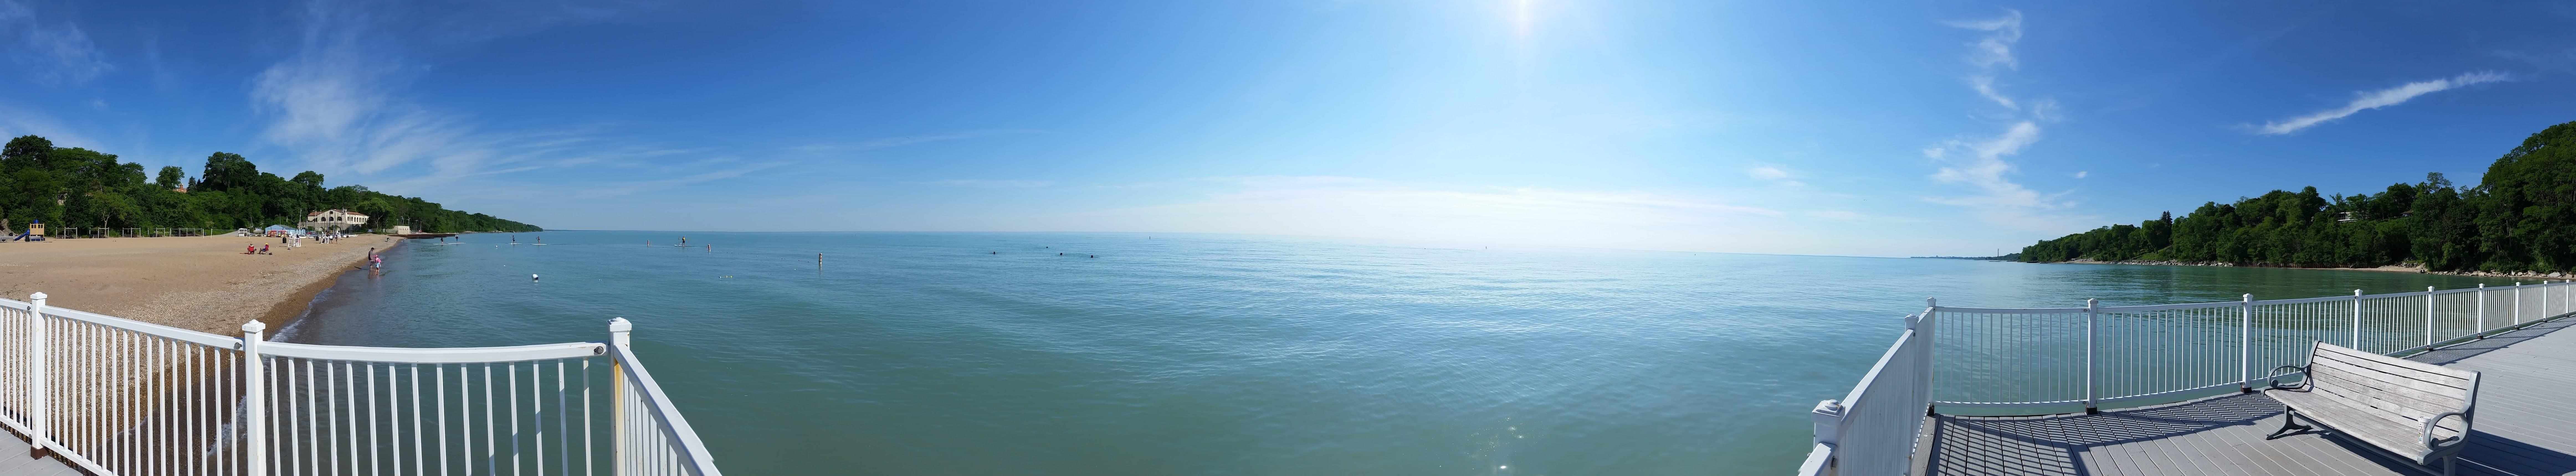 Glencoe Lake Michigan View